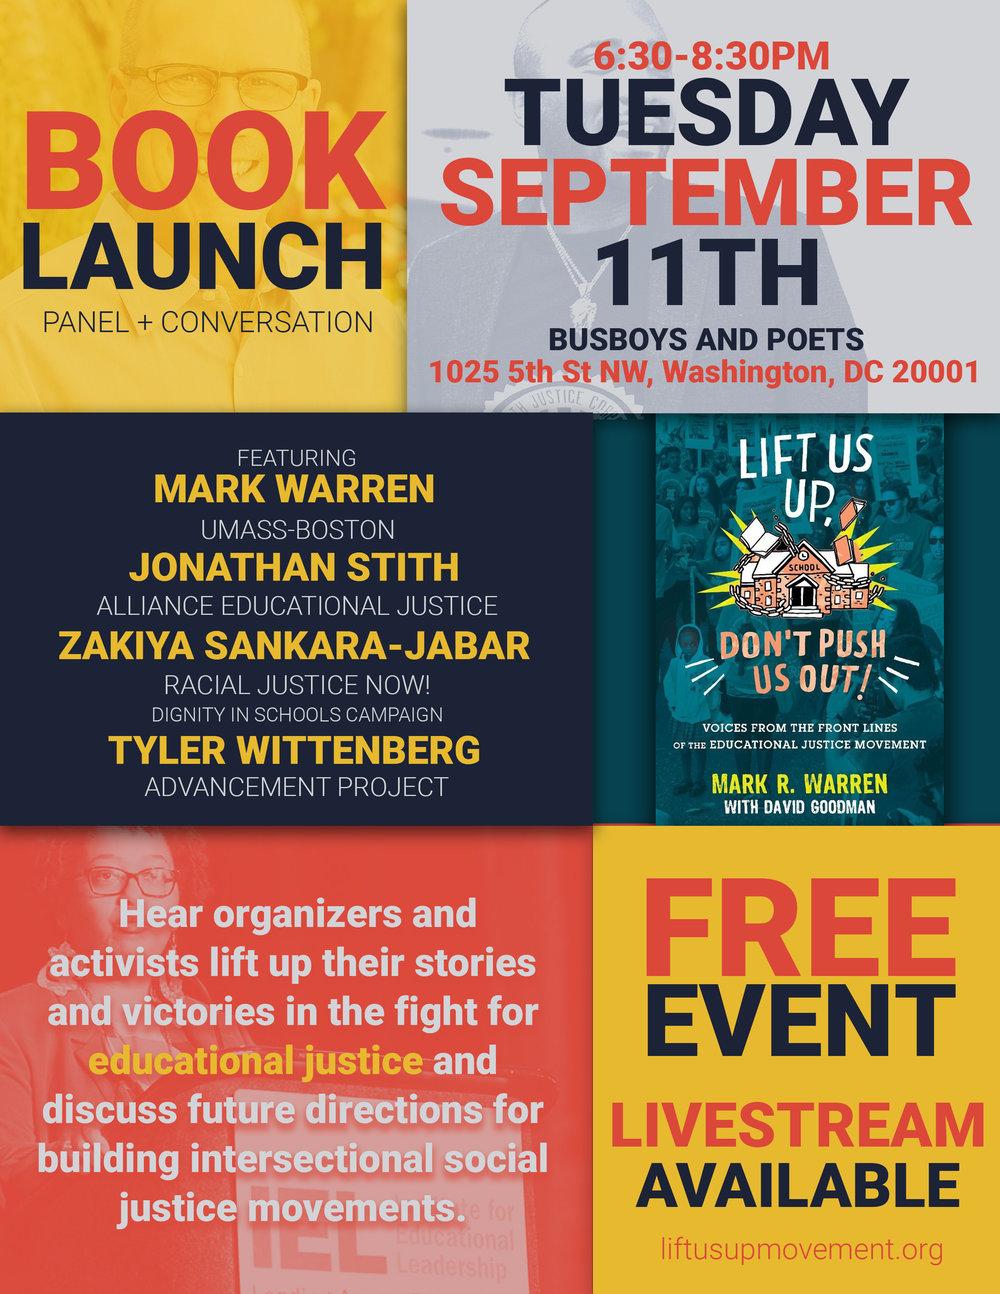 Book Launch Flier (1).jpg